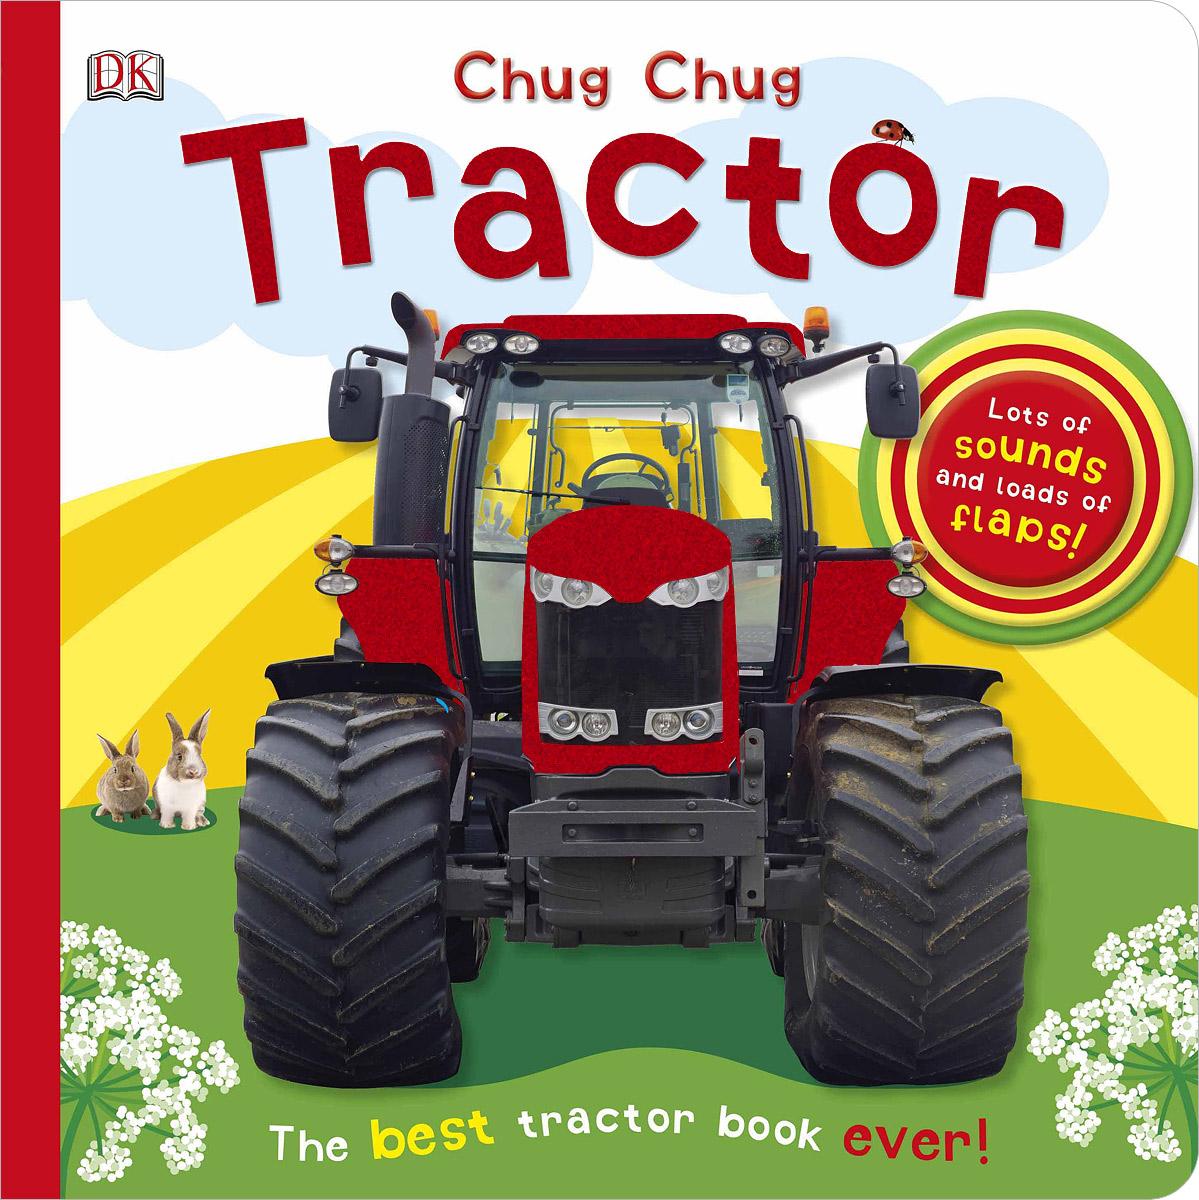 Chug Chug Tractor supermarket gremlins lift the flaps book